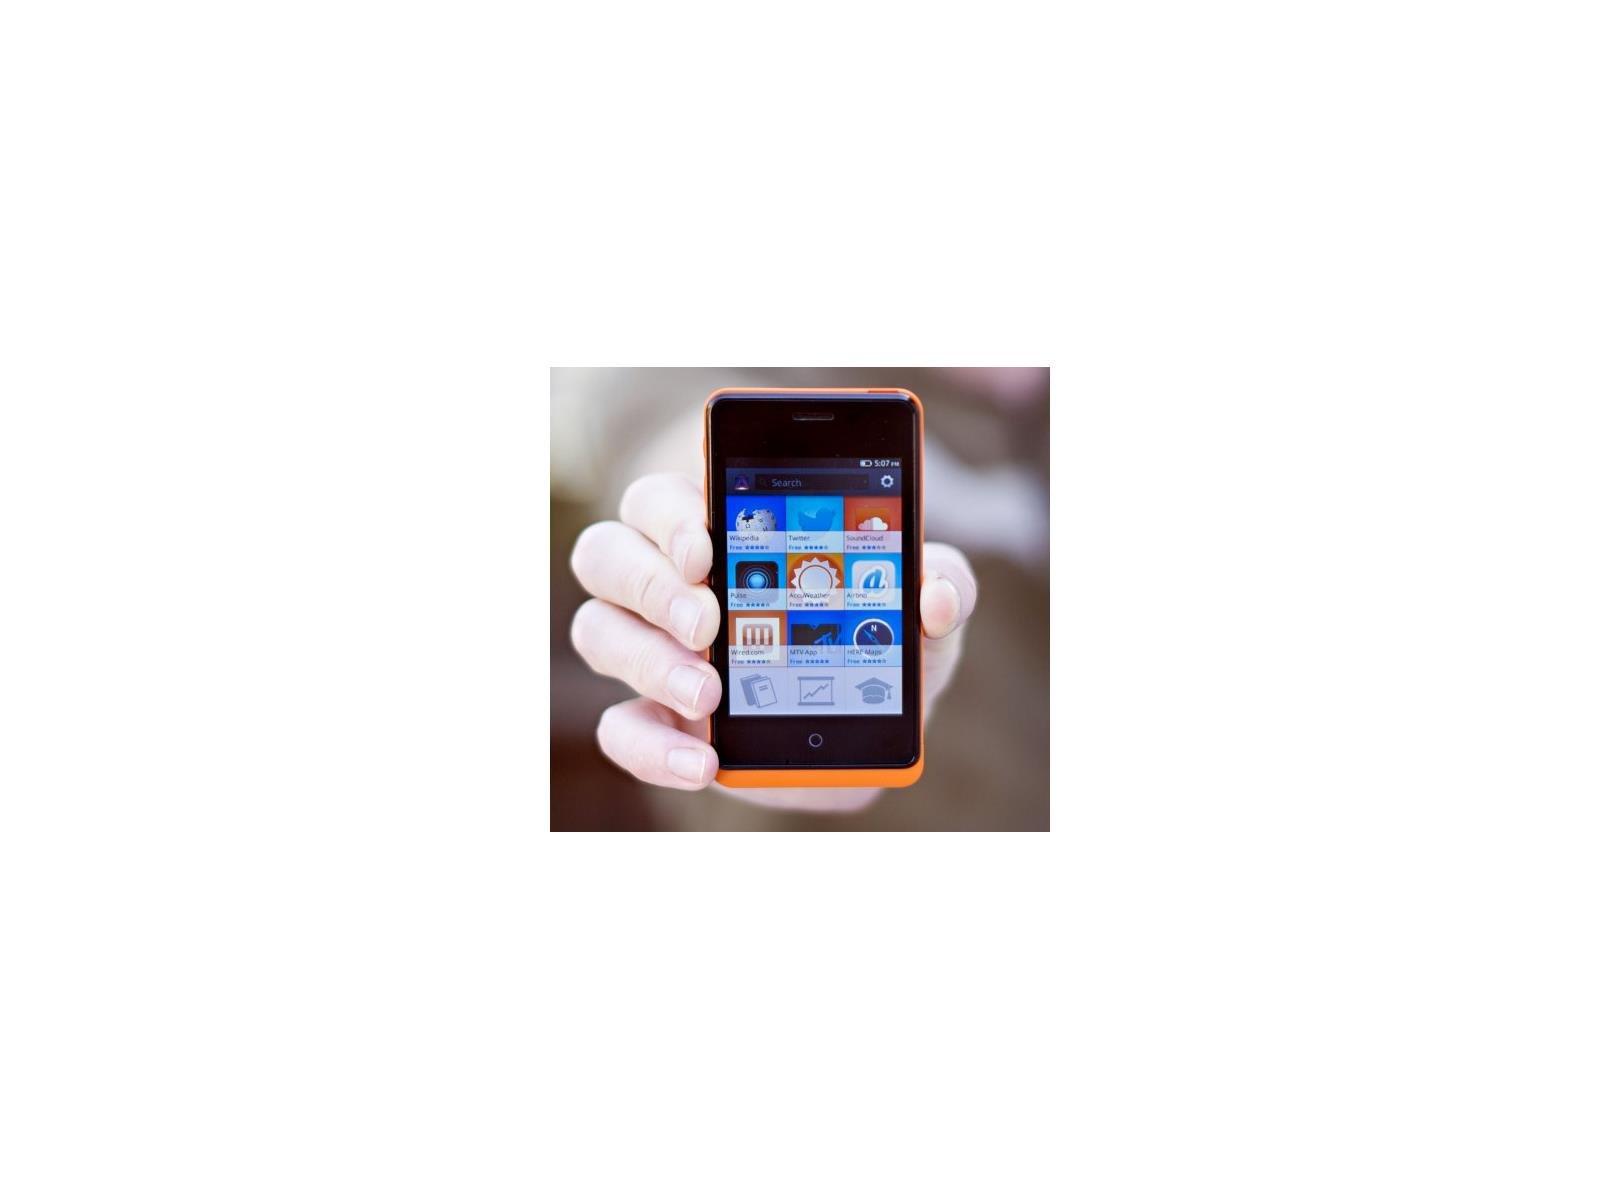 Mozilla Handing Out Free Firefox OS Developer Phones To Bolster App